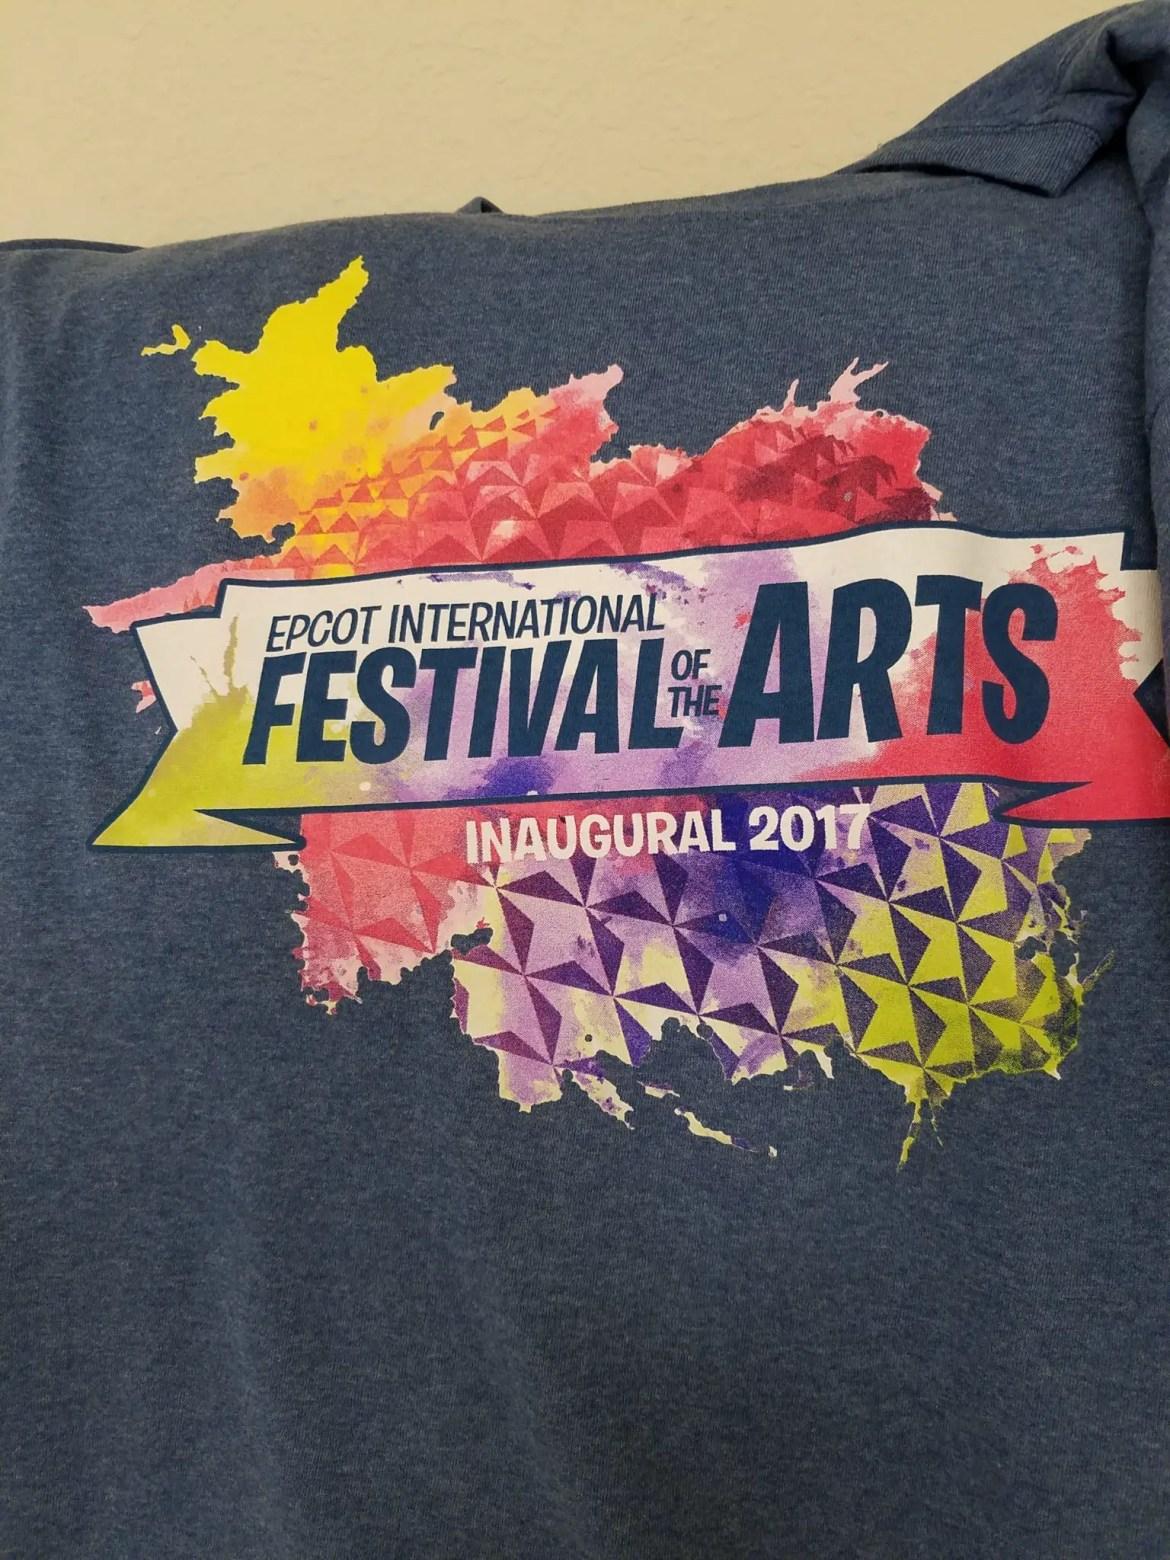 Epcot's Festival of the Arts Annual Passholder Merchandise